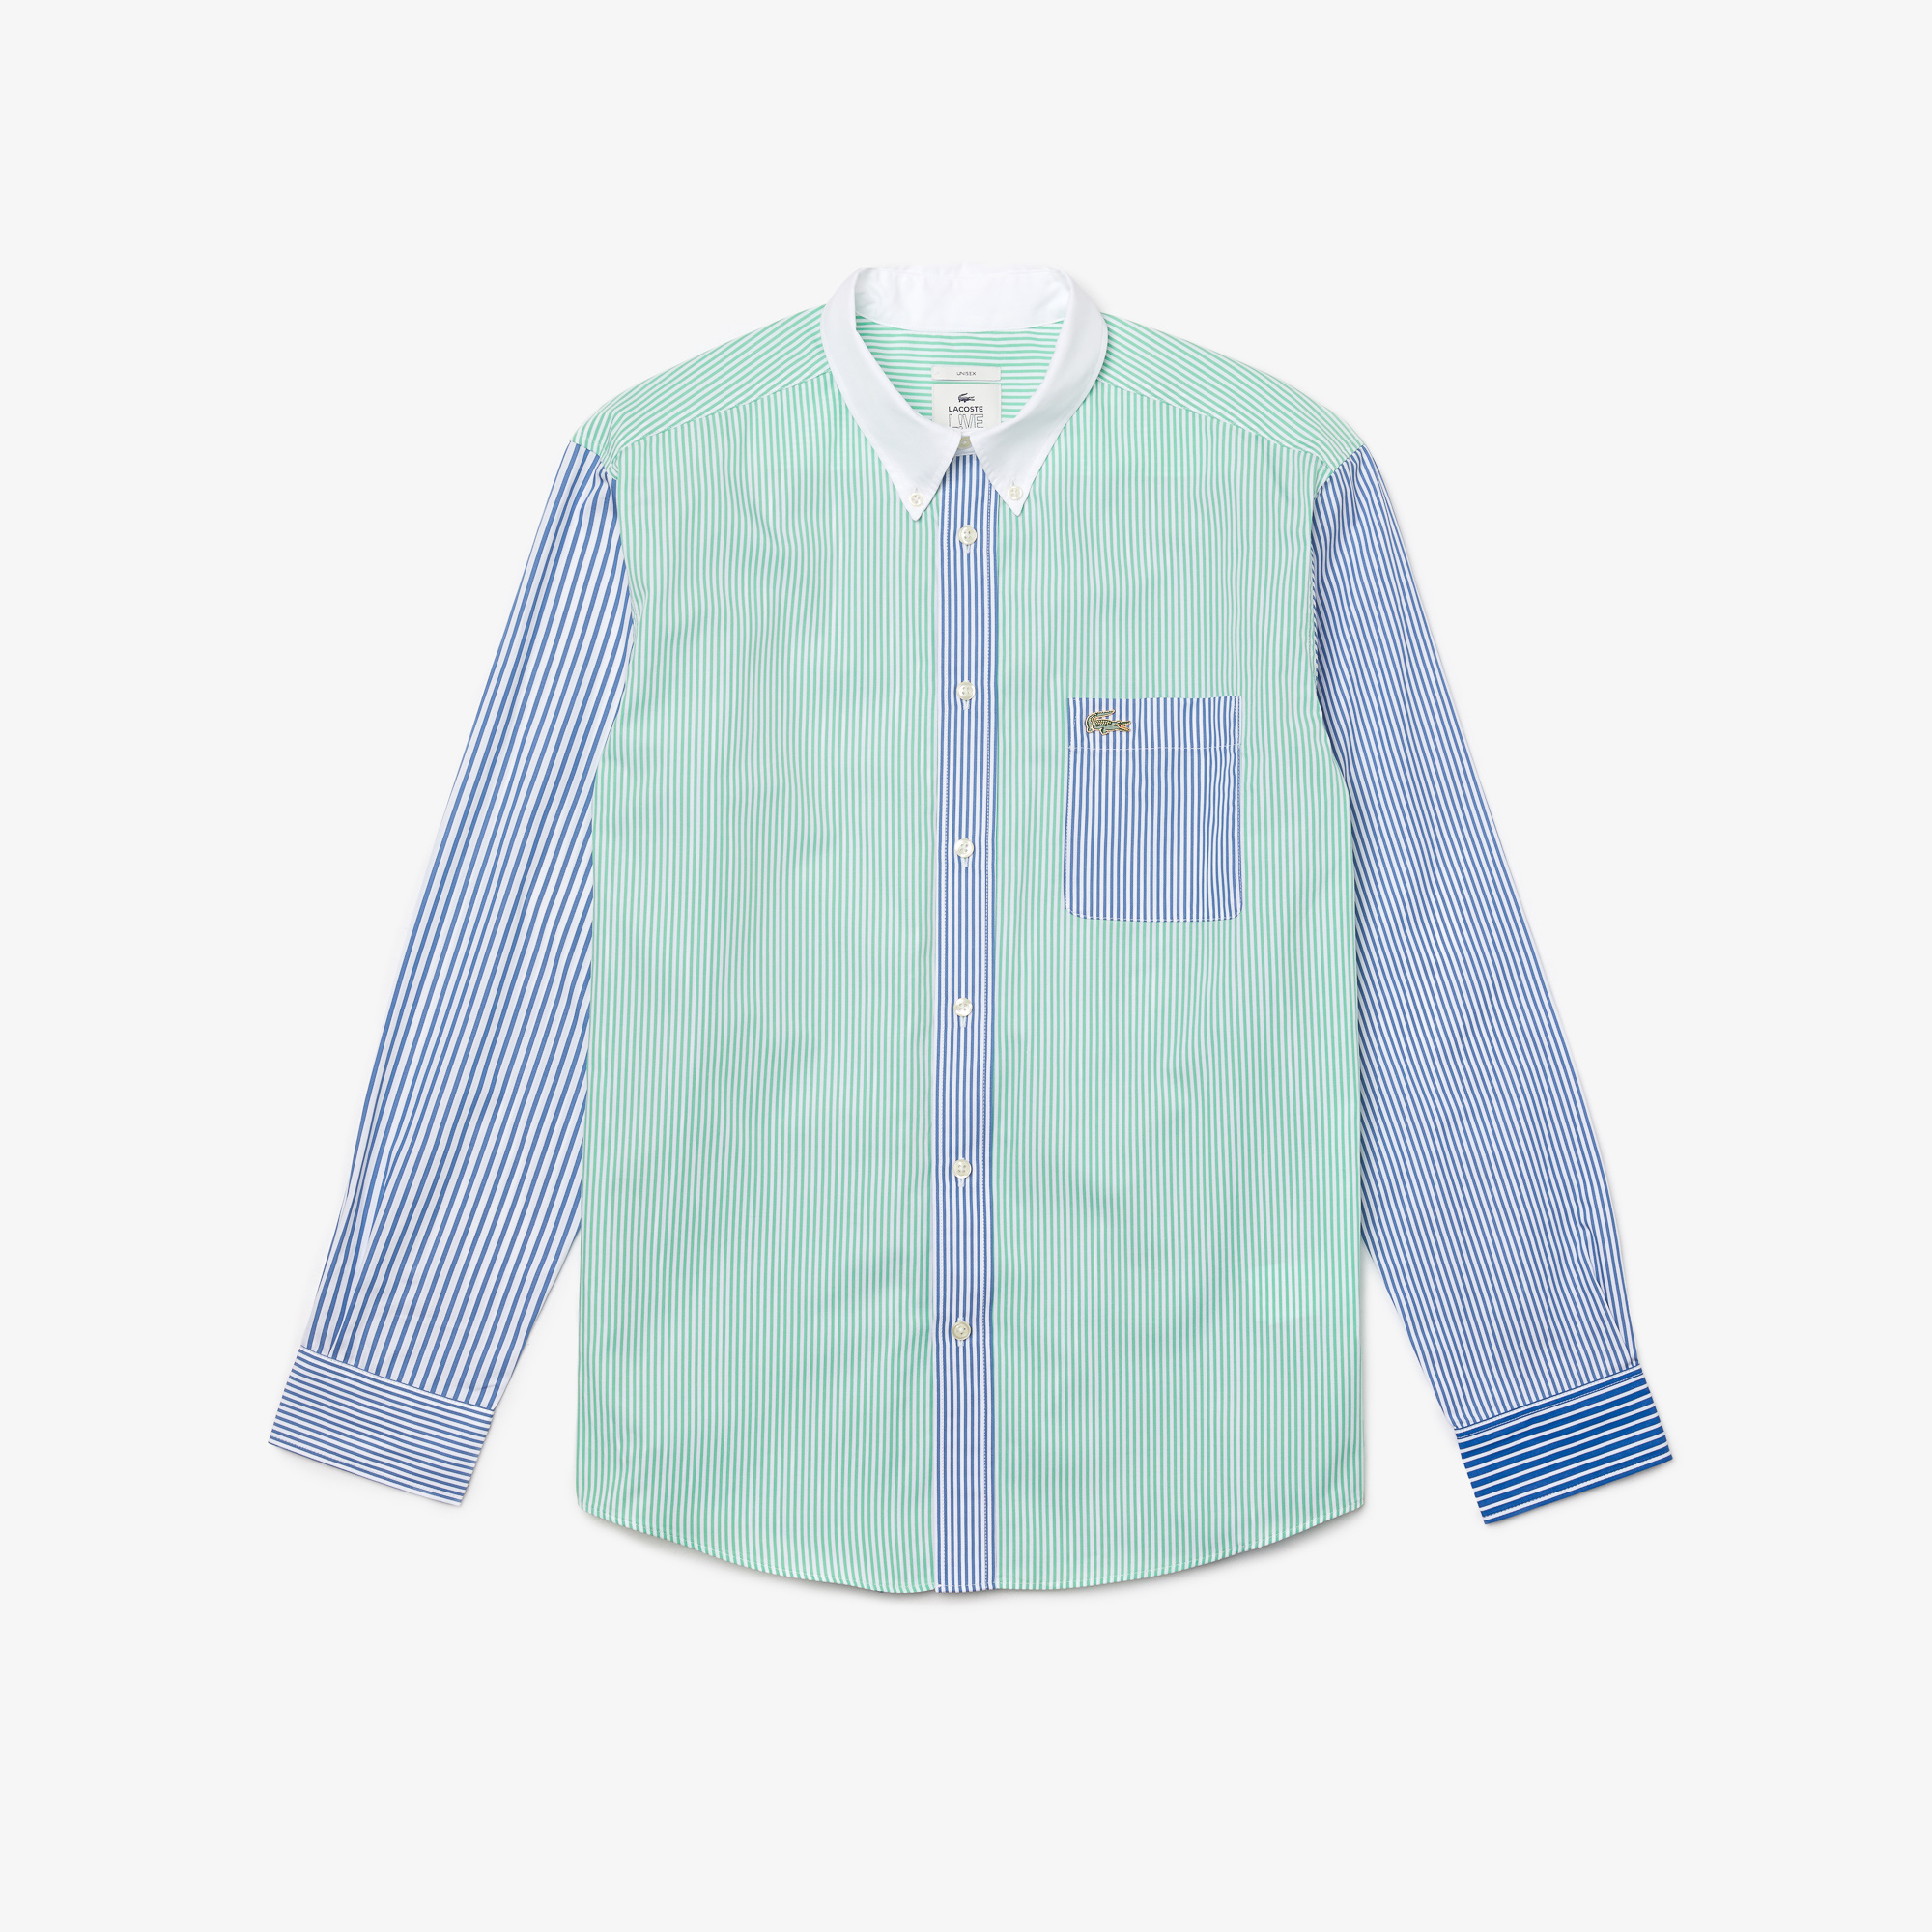 Lacoste L!VE Bawełniana koszula Relaxed Fit unisex w paski